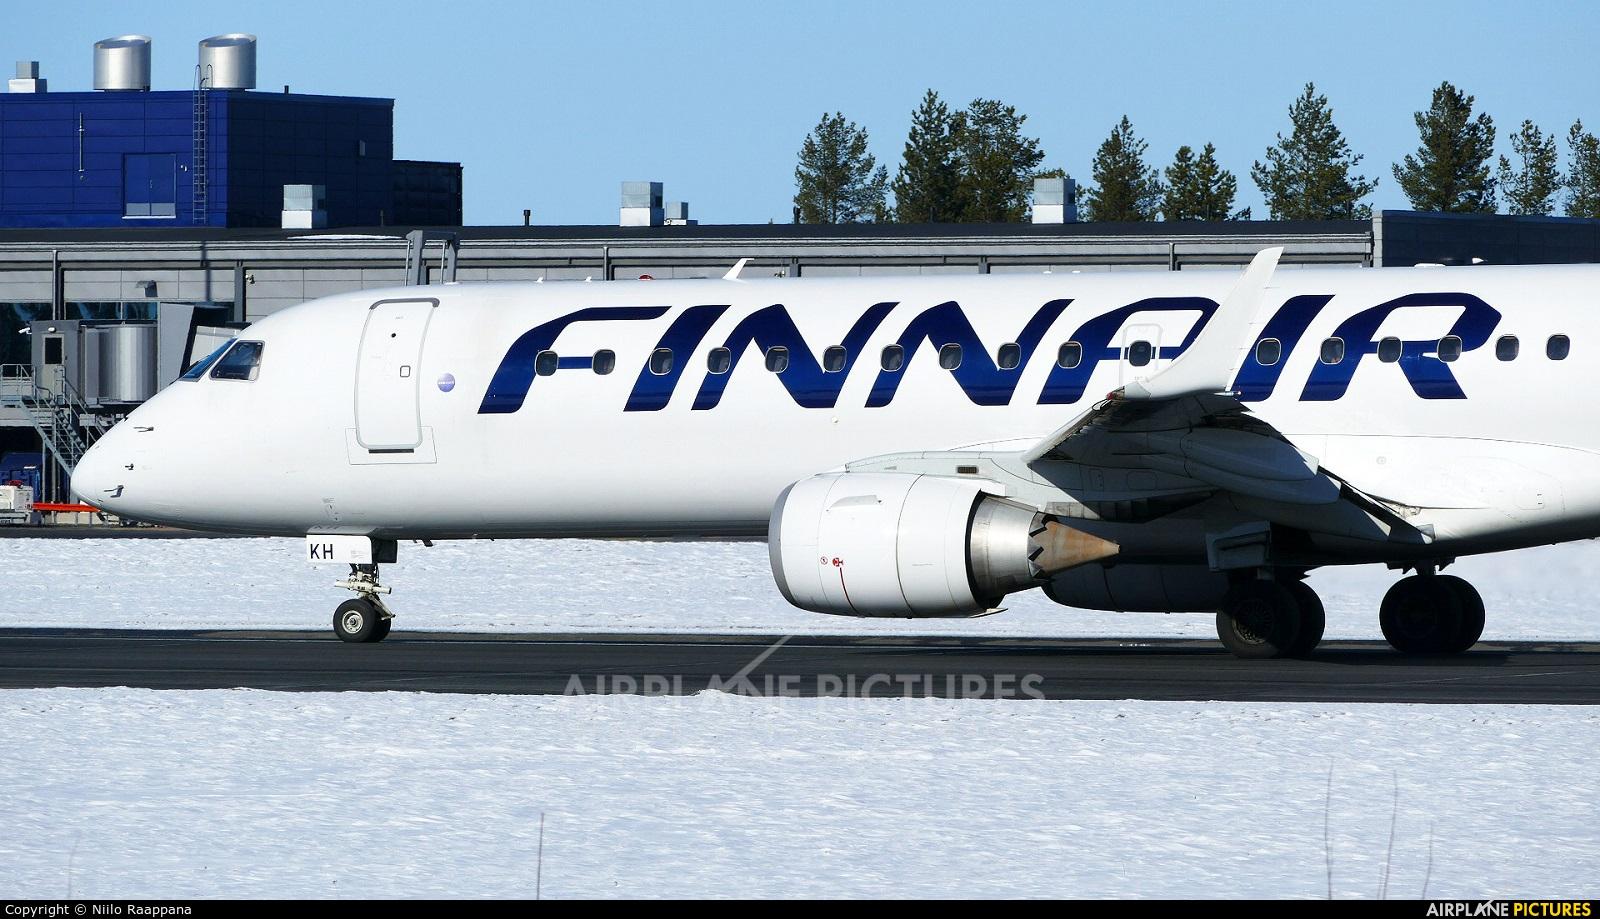 Finnair OH-LKH aircraft at Oulu